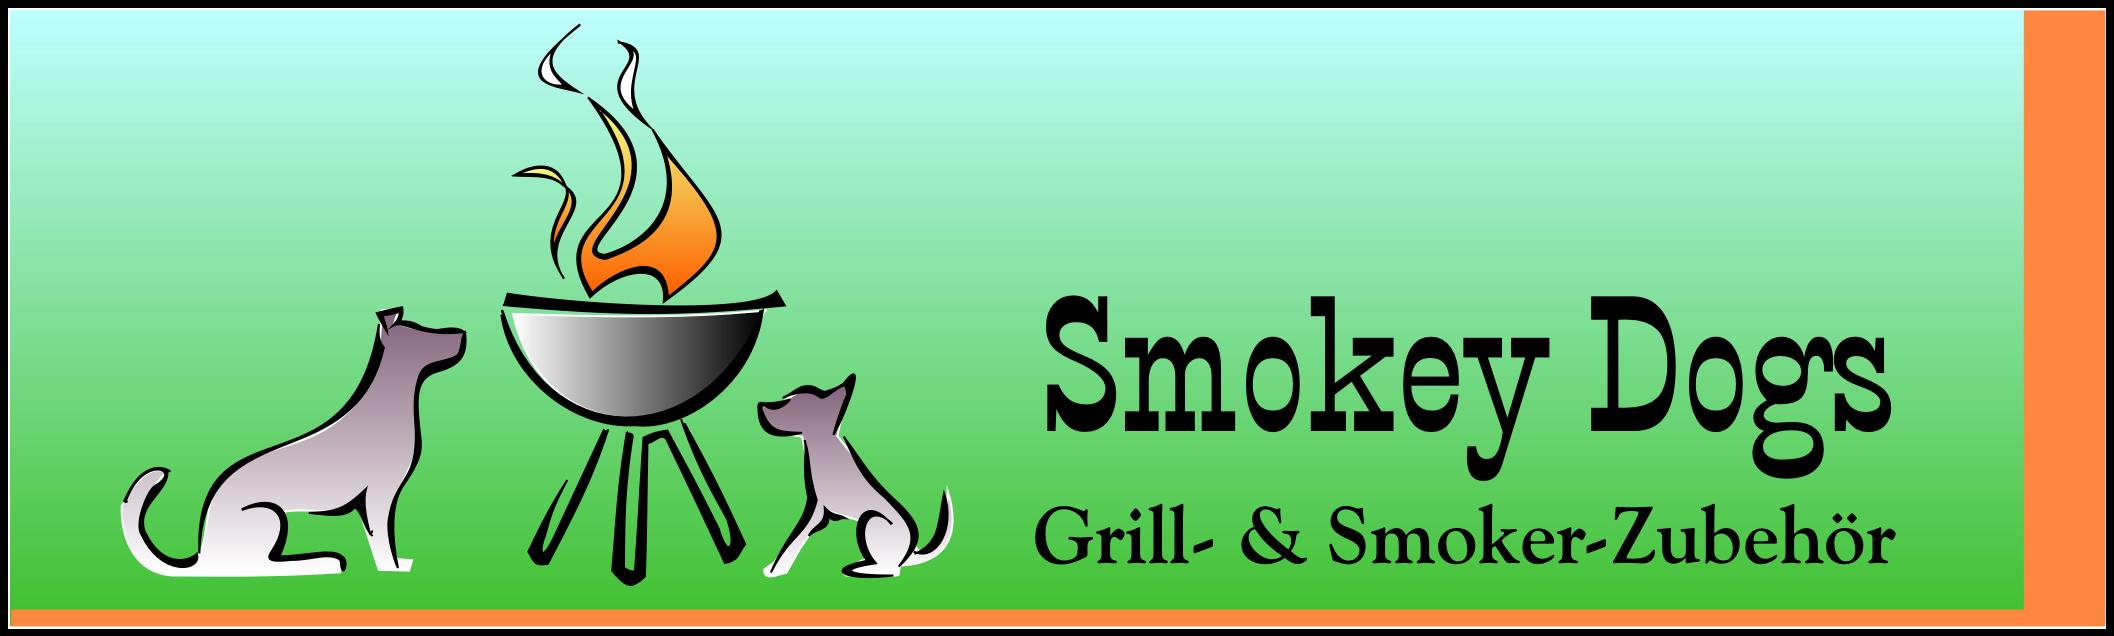 Smokey Dogs - Grill- & Smoker-Zubehör